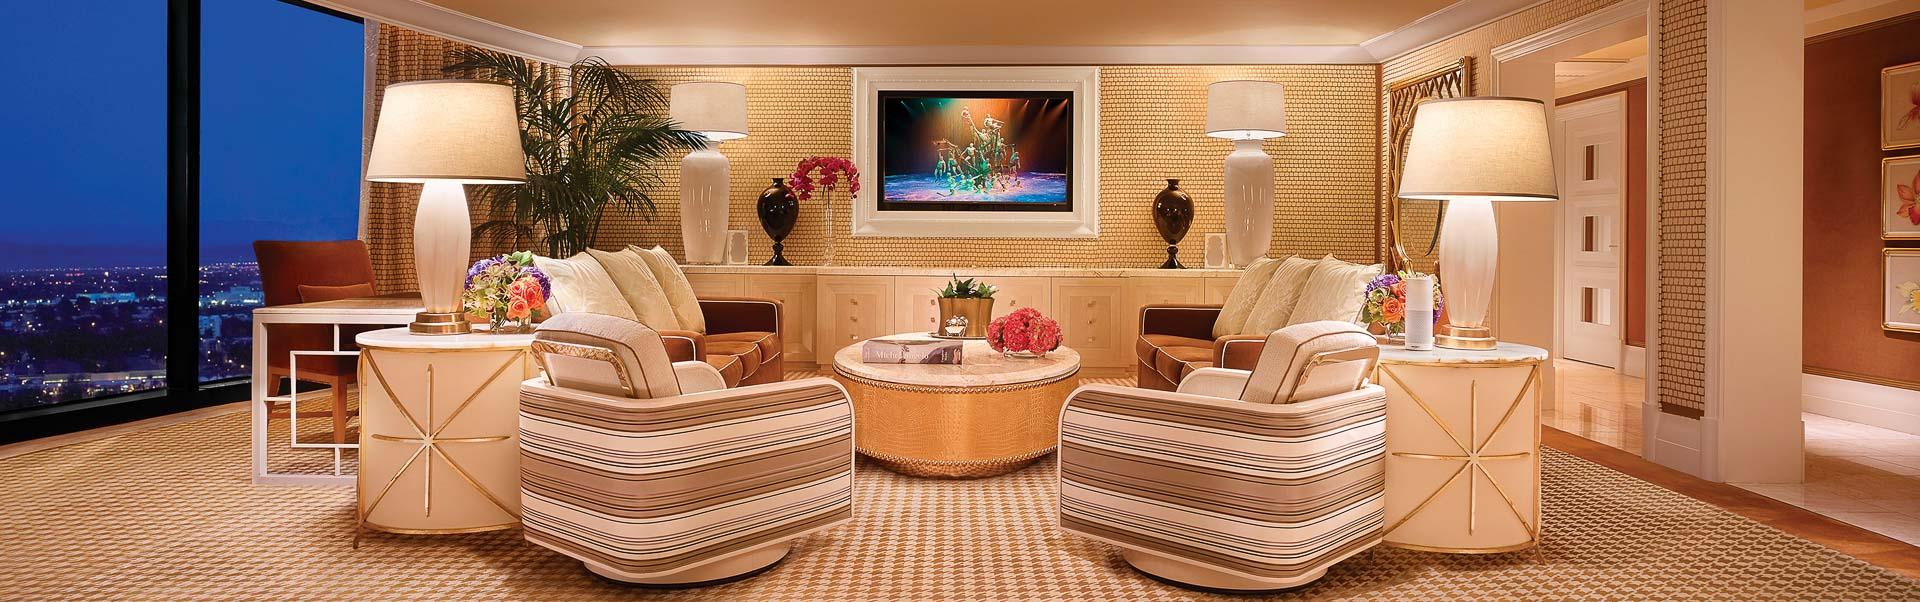 Luxury Two Bedroom Apartment Las Vegas Encore Resort Las Vegas